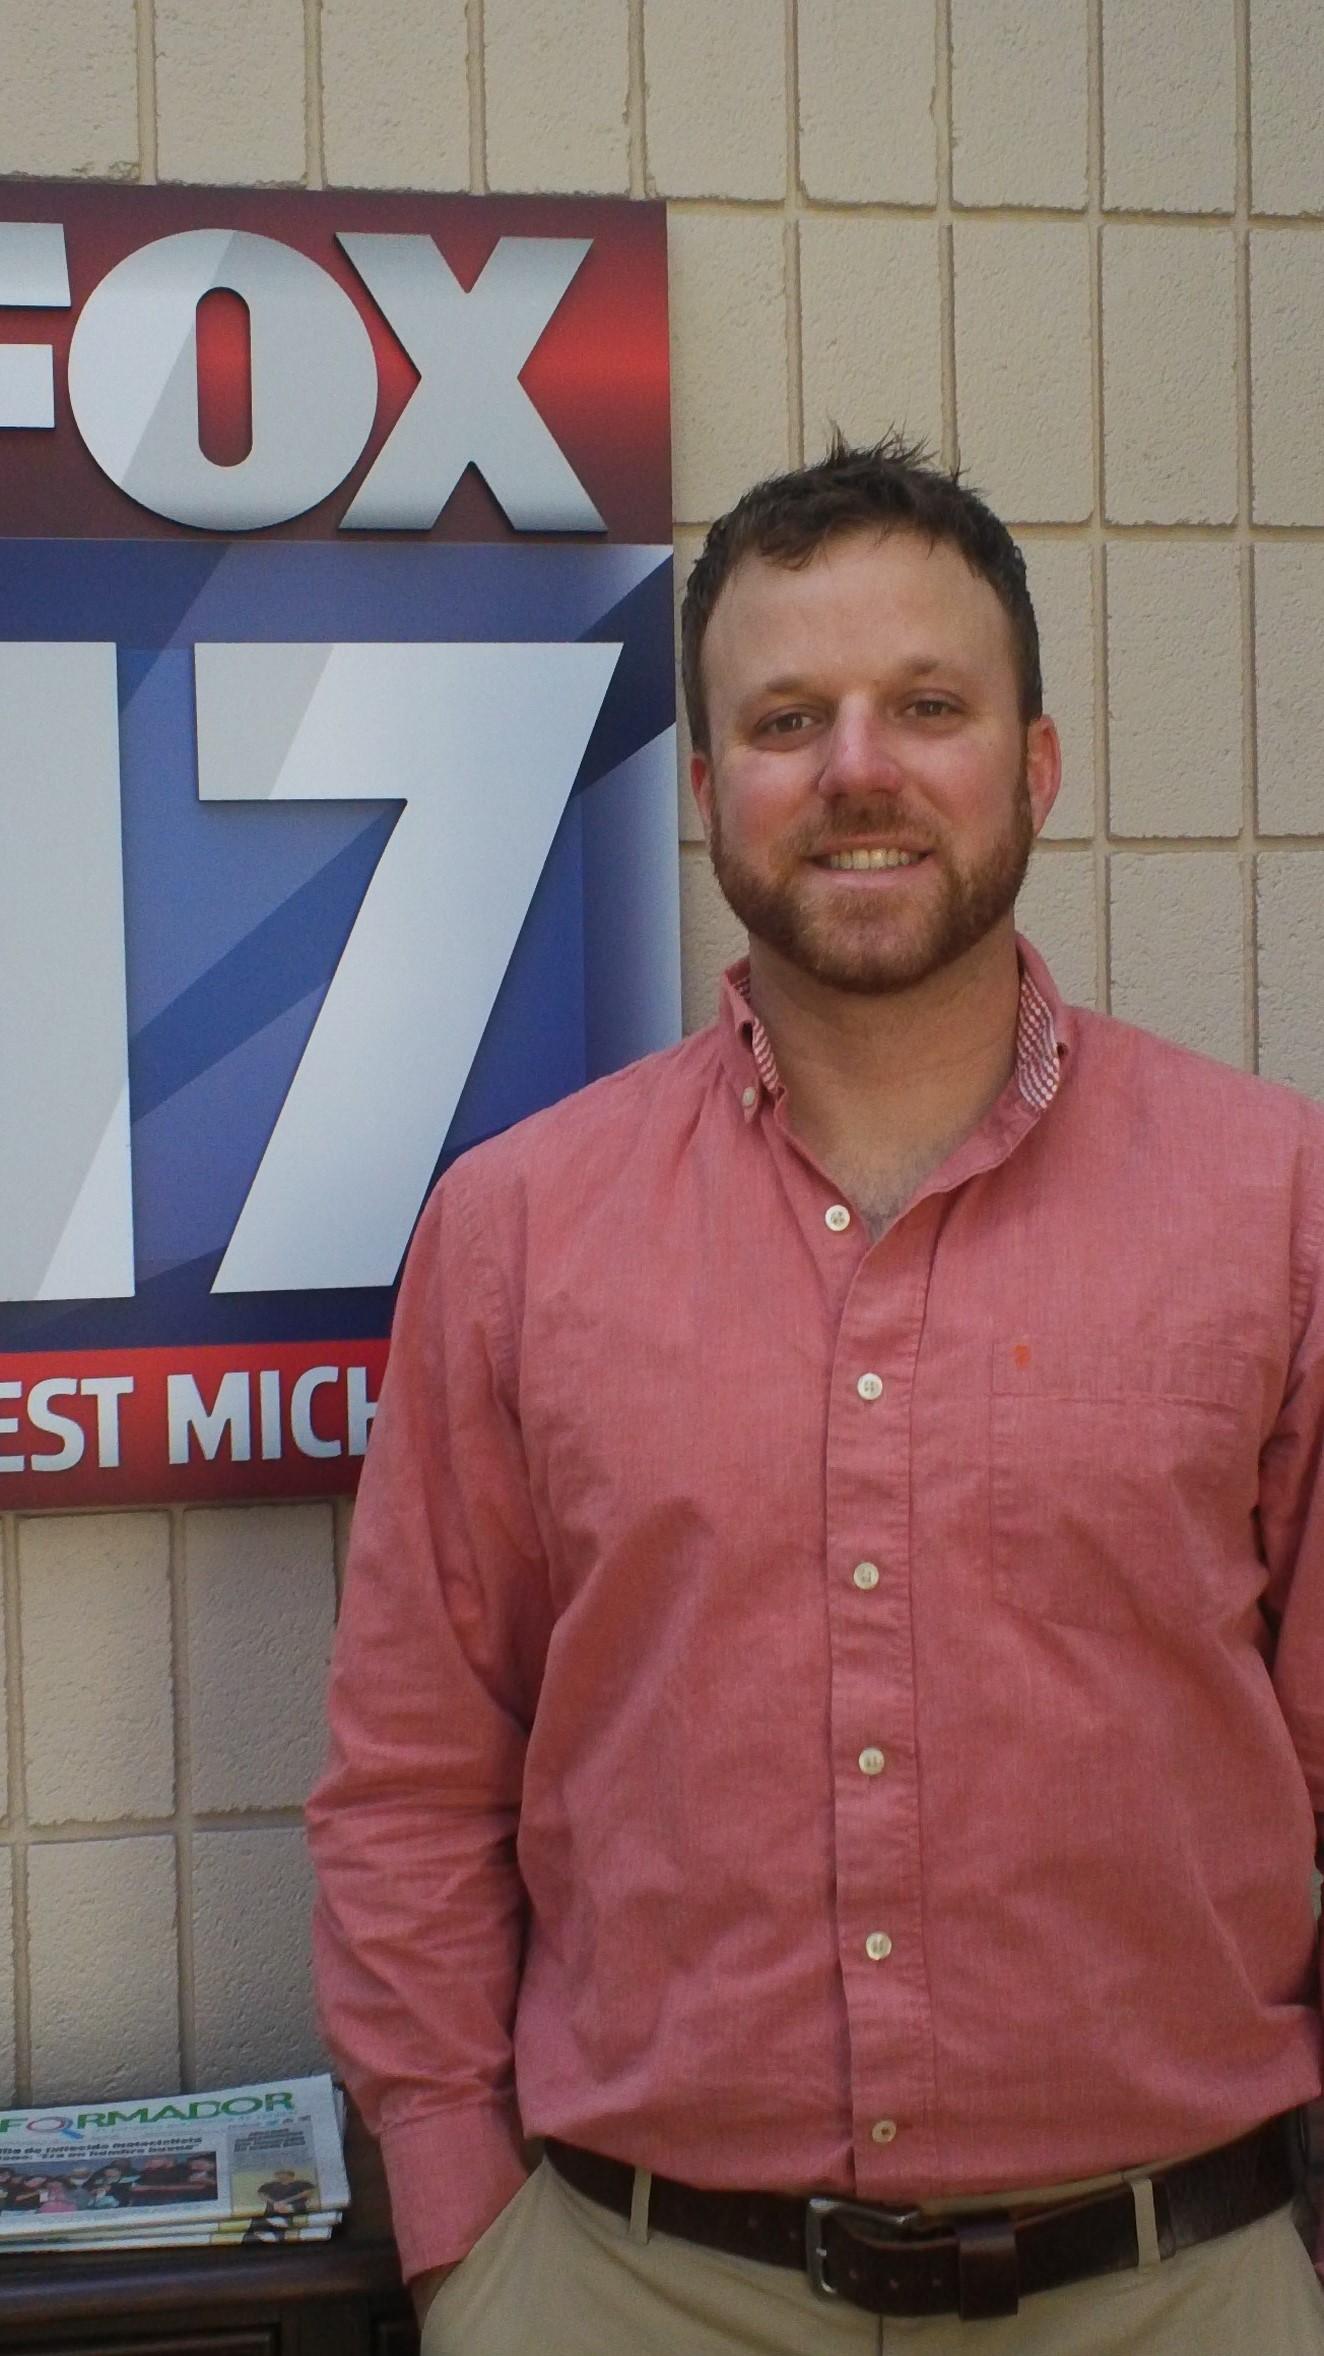 News Bites Digital Media Alum Hired By West Michigan